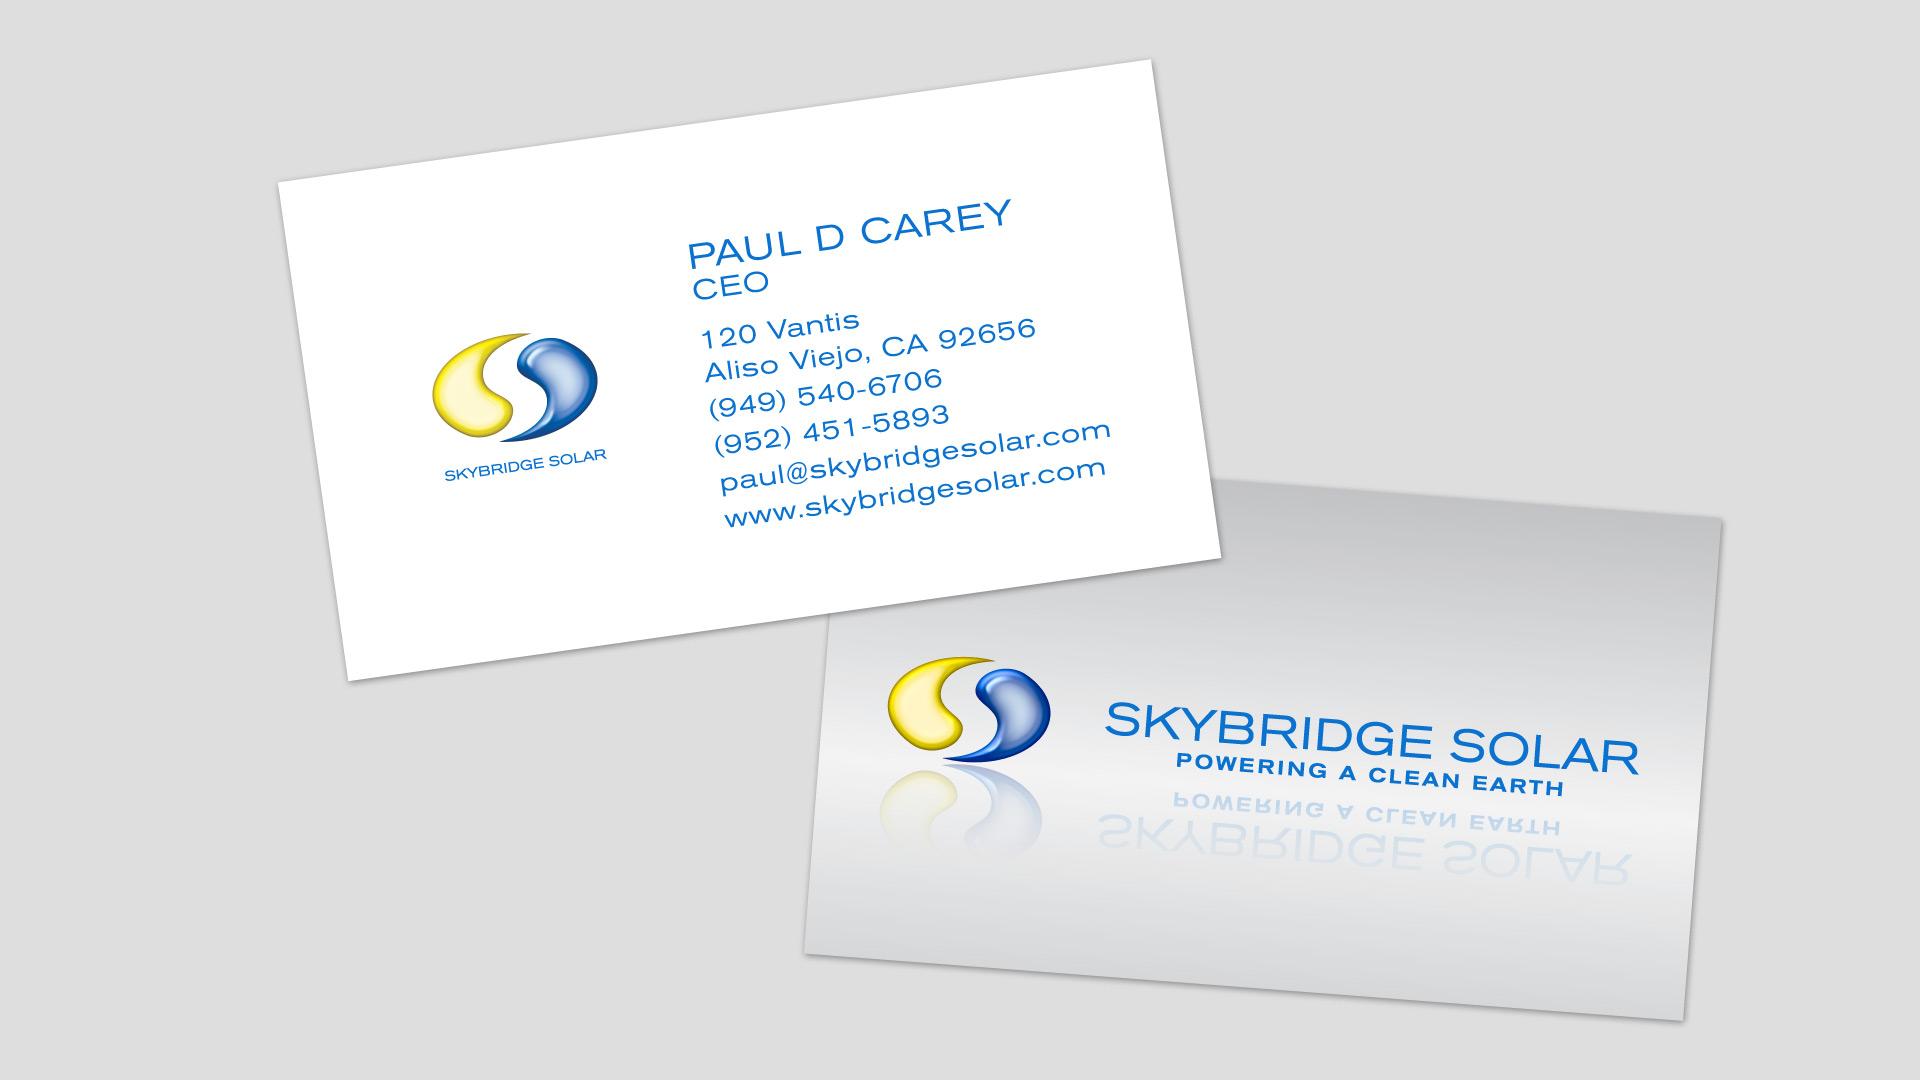 Skybridge Solar Business Card